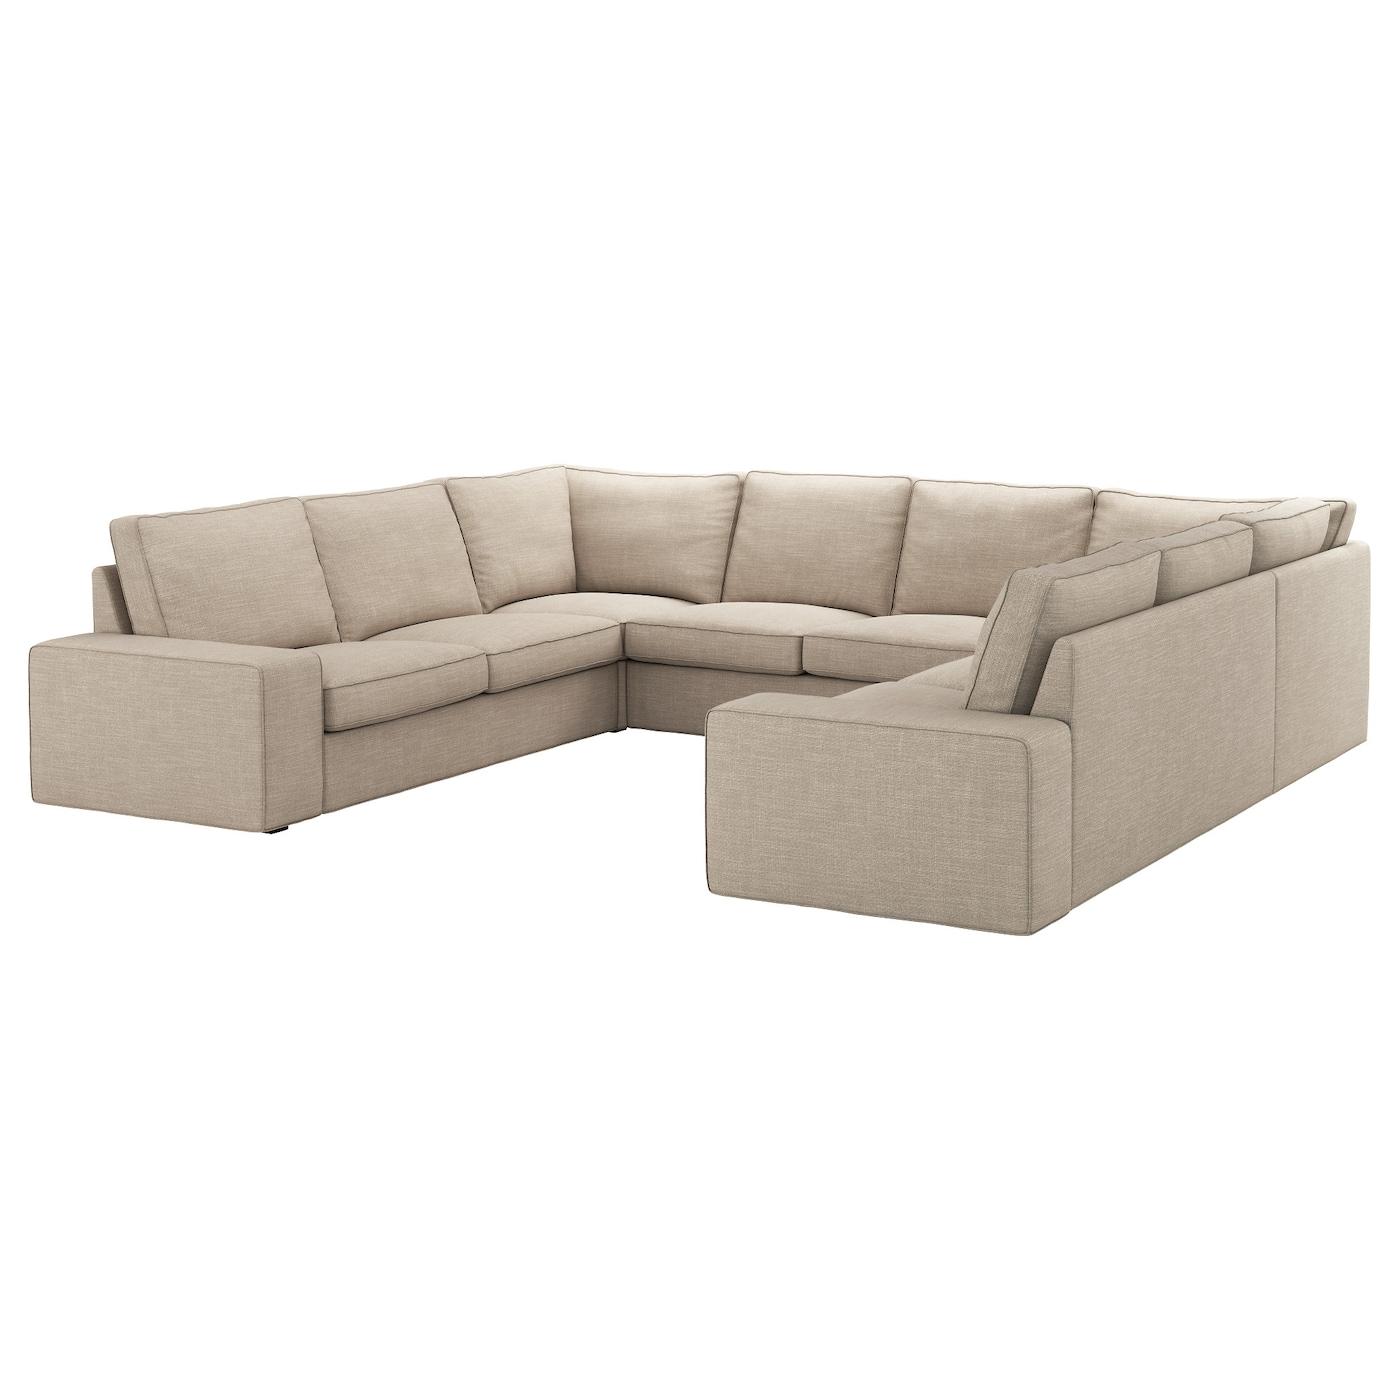 KIVIK U shaped sofa 6 seat Hillared beige IKEA